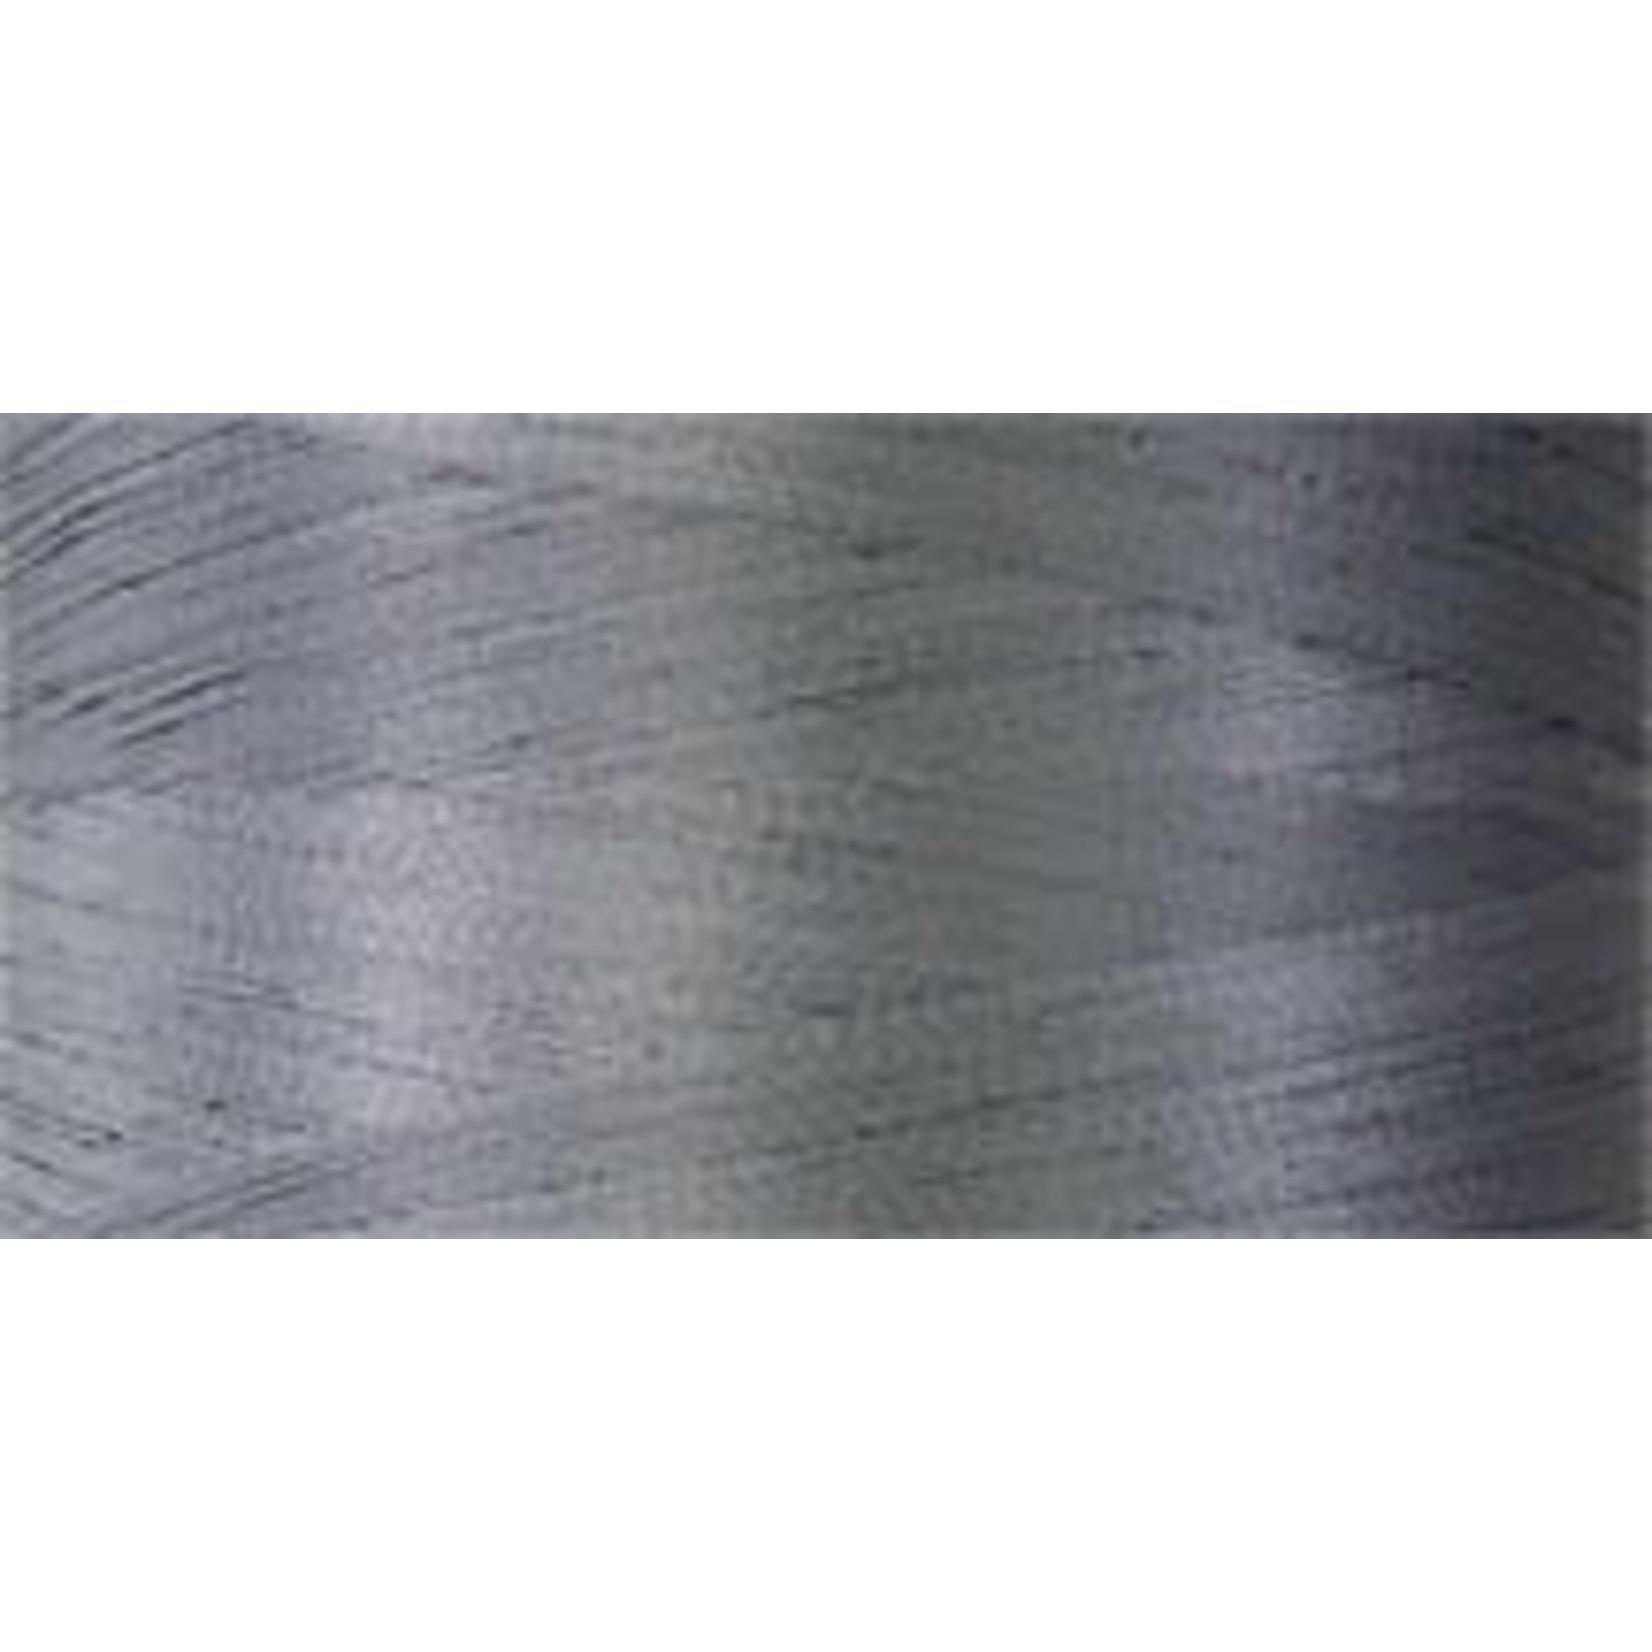 Superior Threads Bottom Line - #60 - 1300 m - 622 Gray